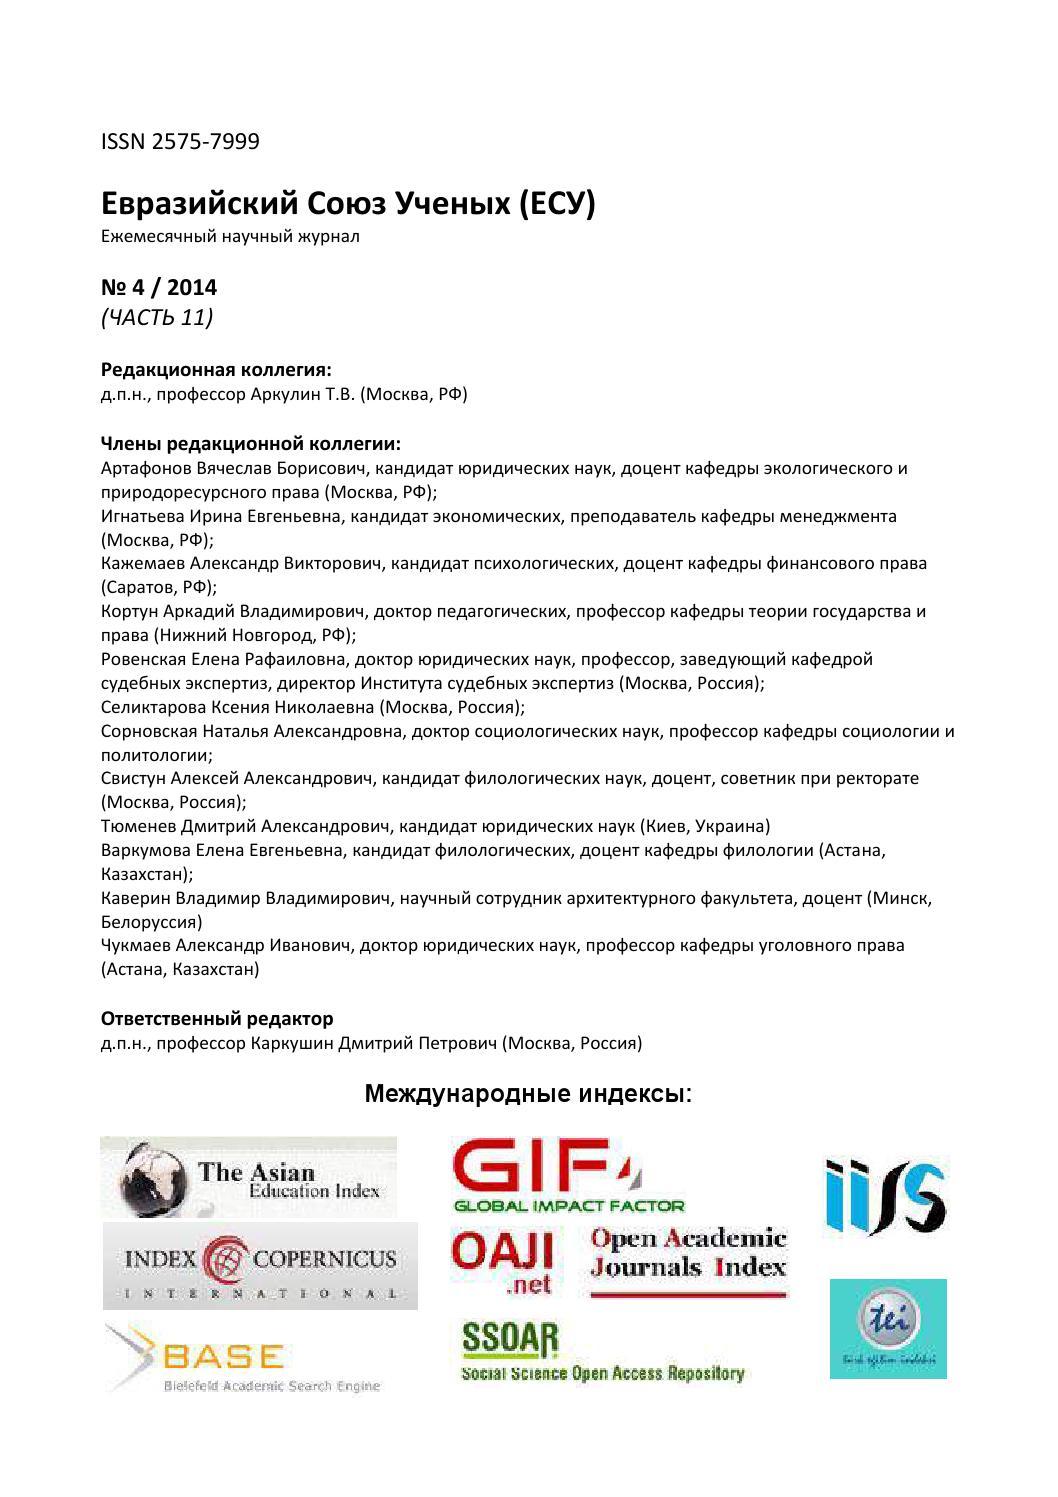 P11 фил пол By Euroasia Science Issuu